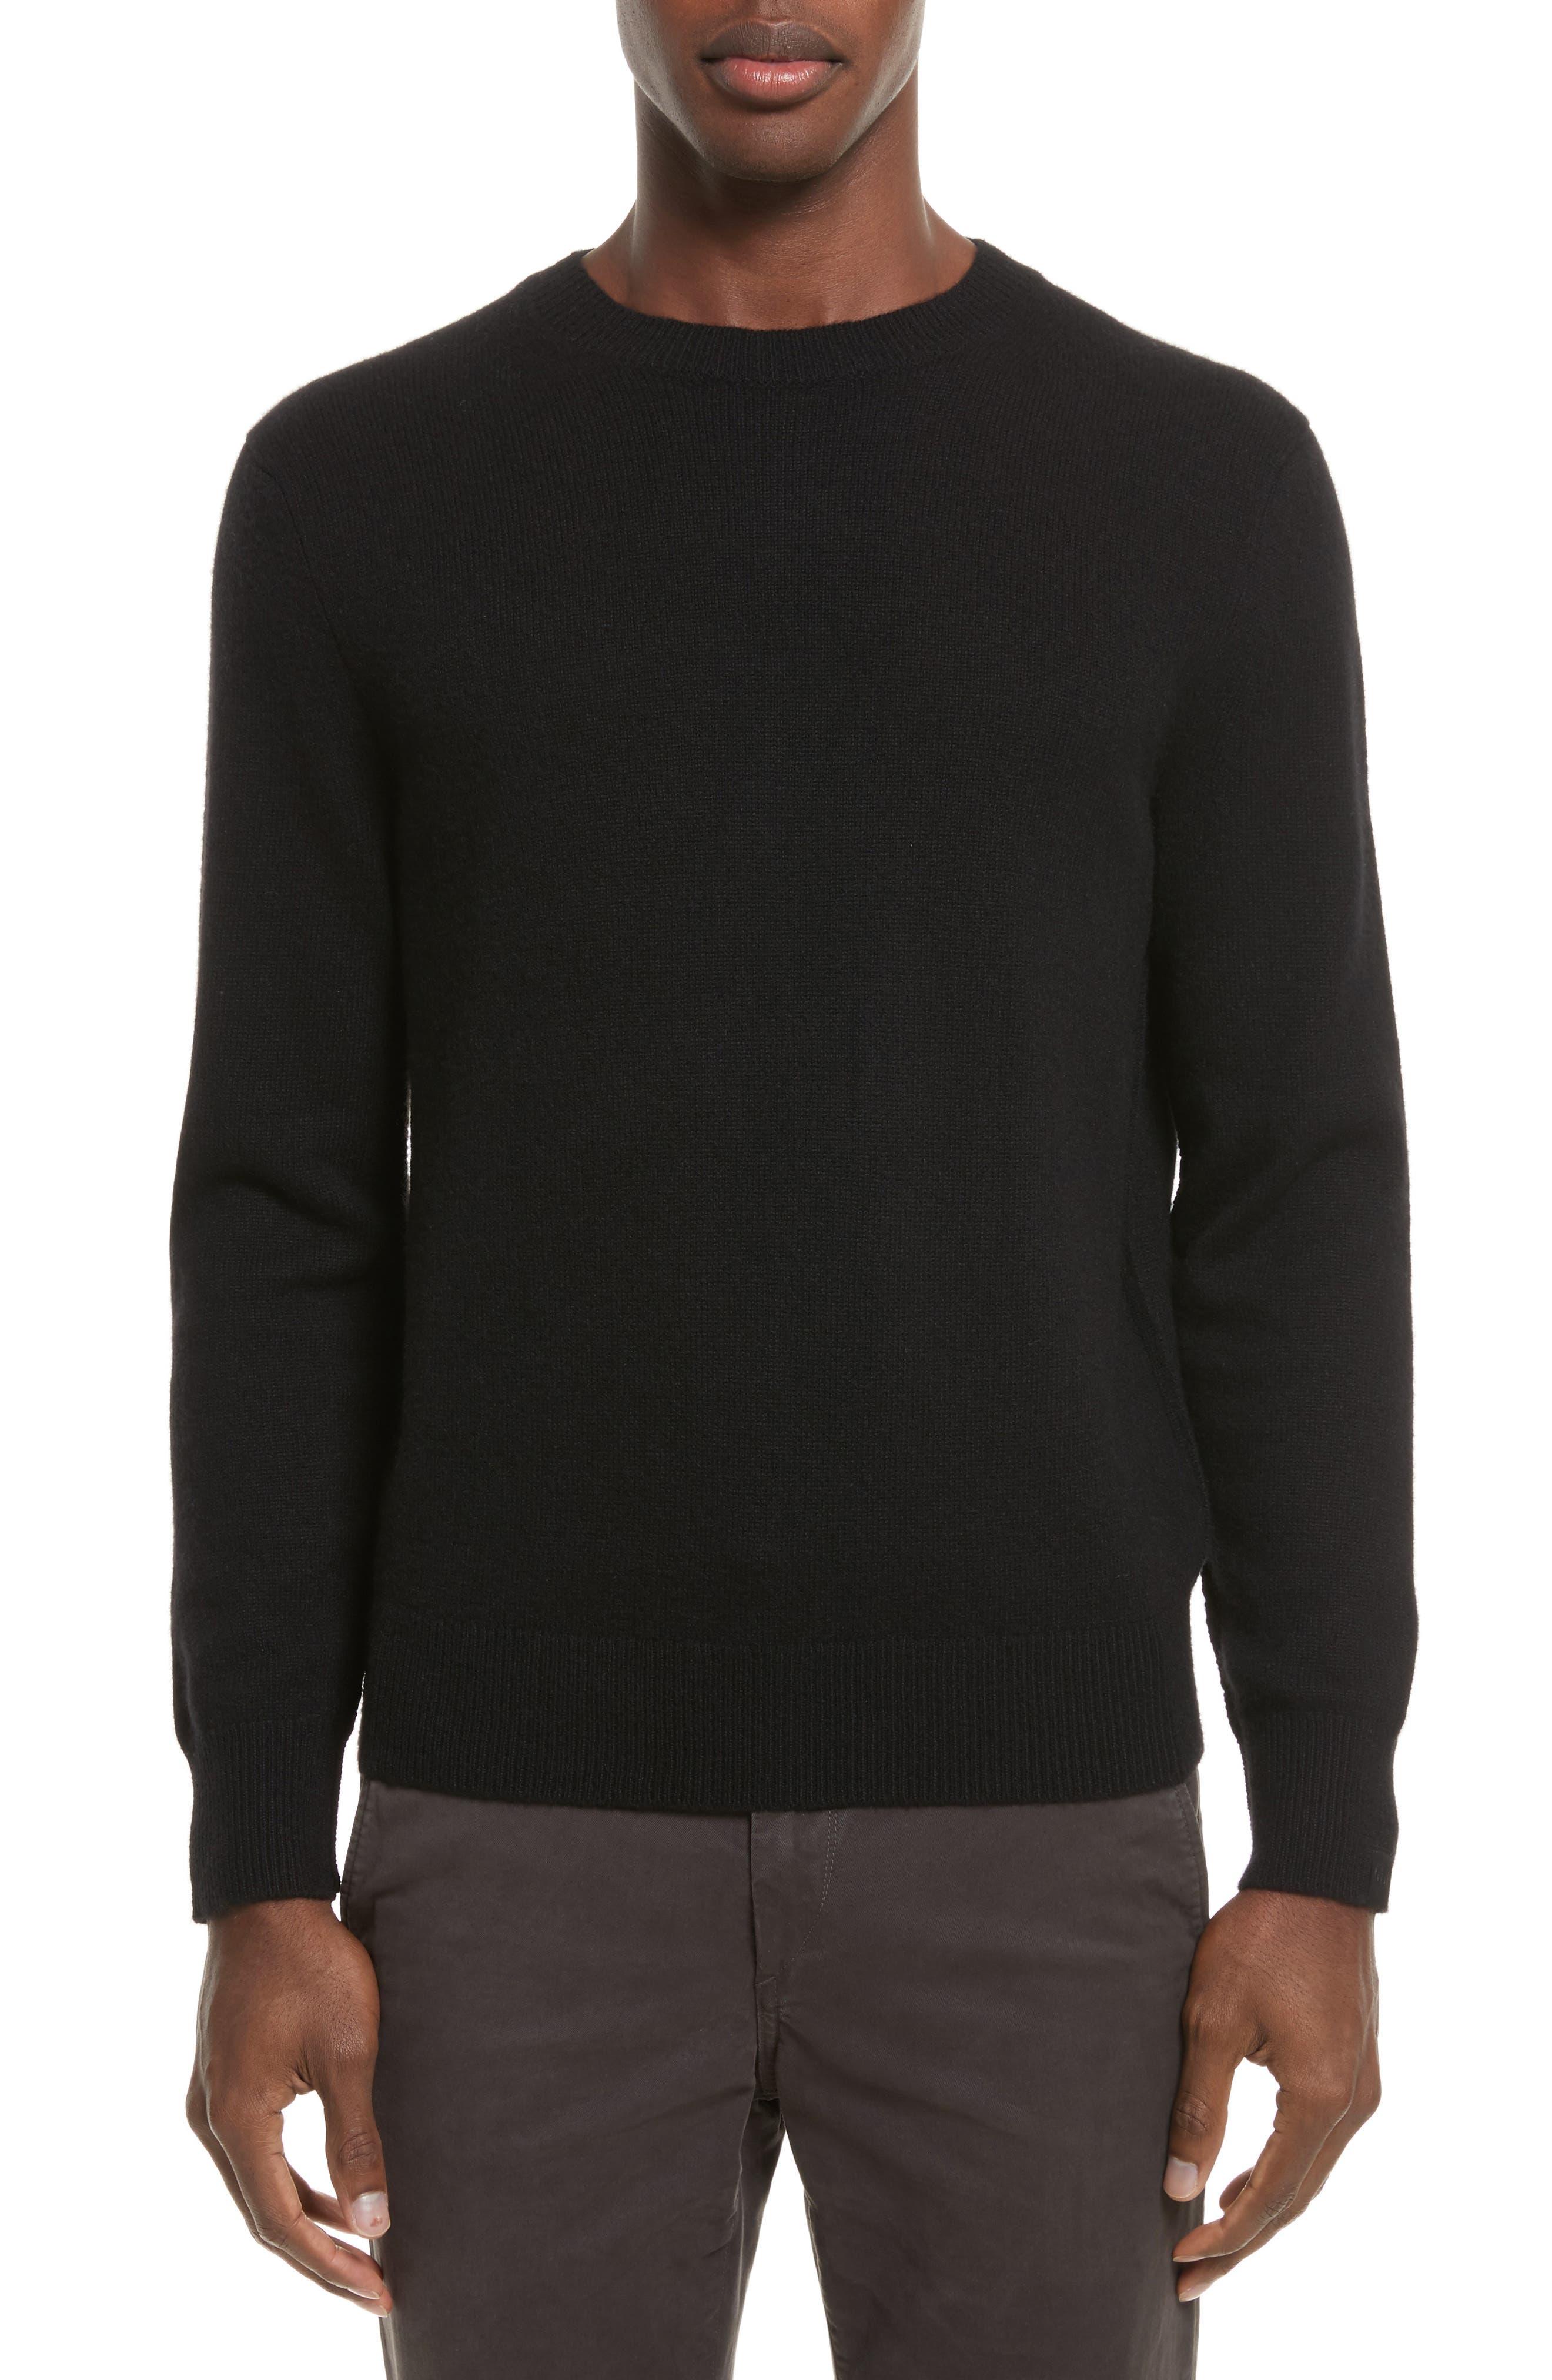 Alternate Image 1 Selected - rag & bone Haldon Cashmere Crewneck Sweatshirt